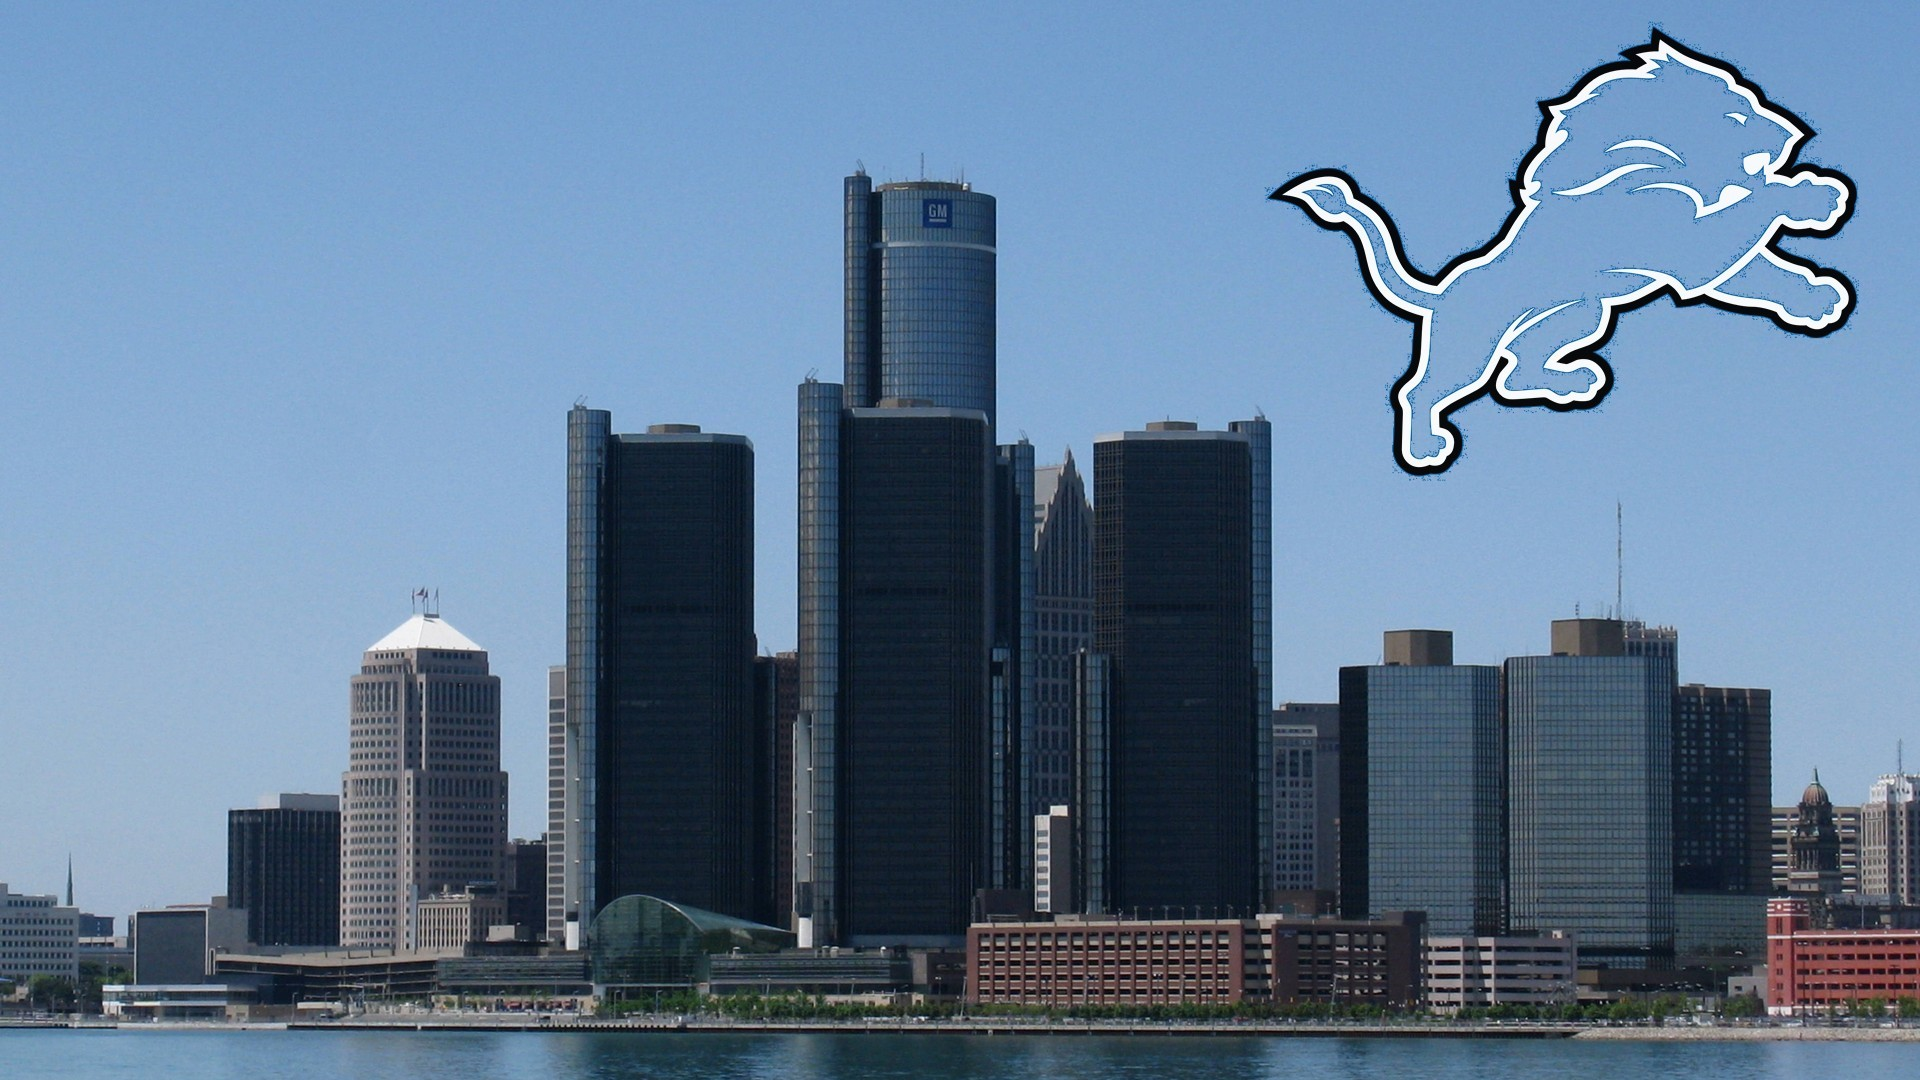 2000x1521 10 HD Detroit Lions Wallpapers